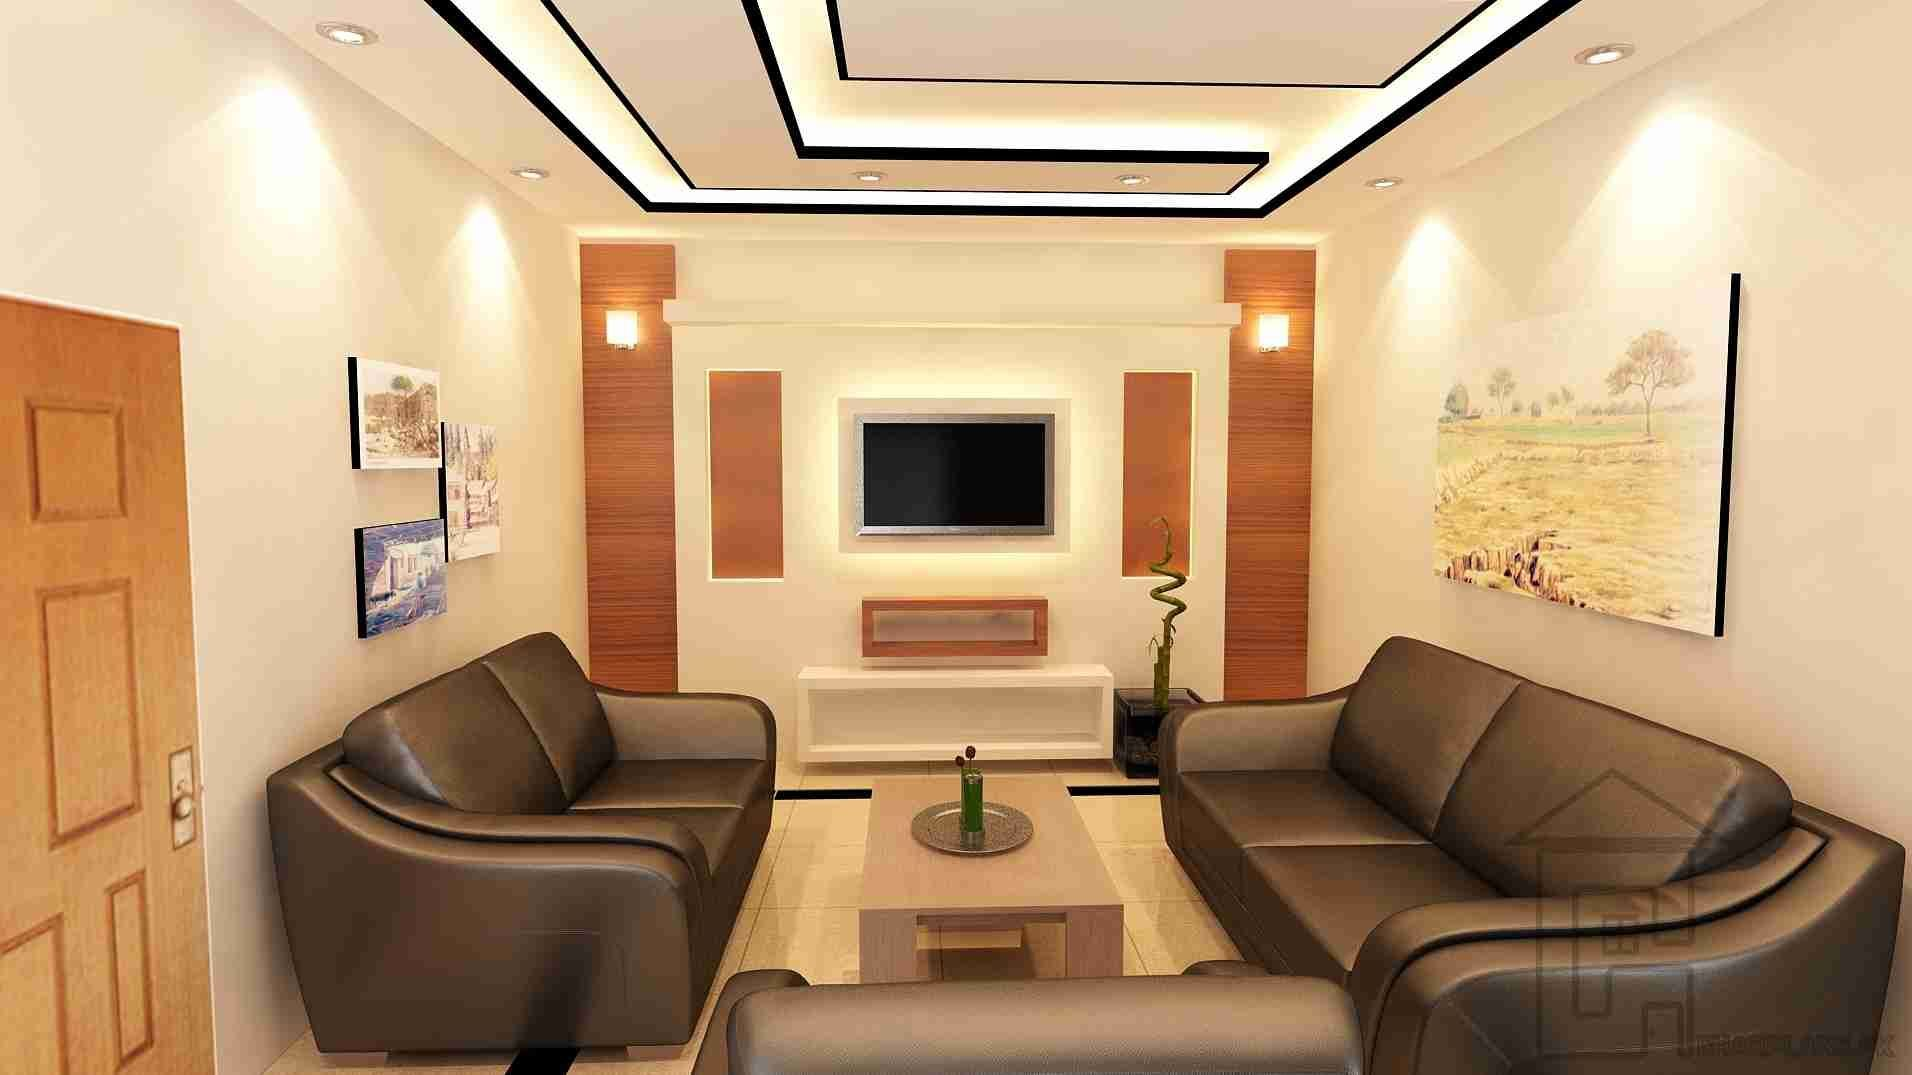 11 Smart Designs Of How To Make 3 Piece Living Room Set Cheap Drawing Room Design Modern Living Room Interior Drawing Room Decor Drawing room design pics